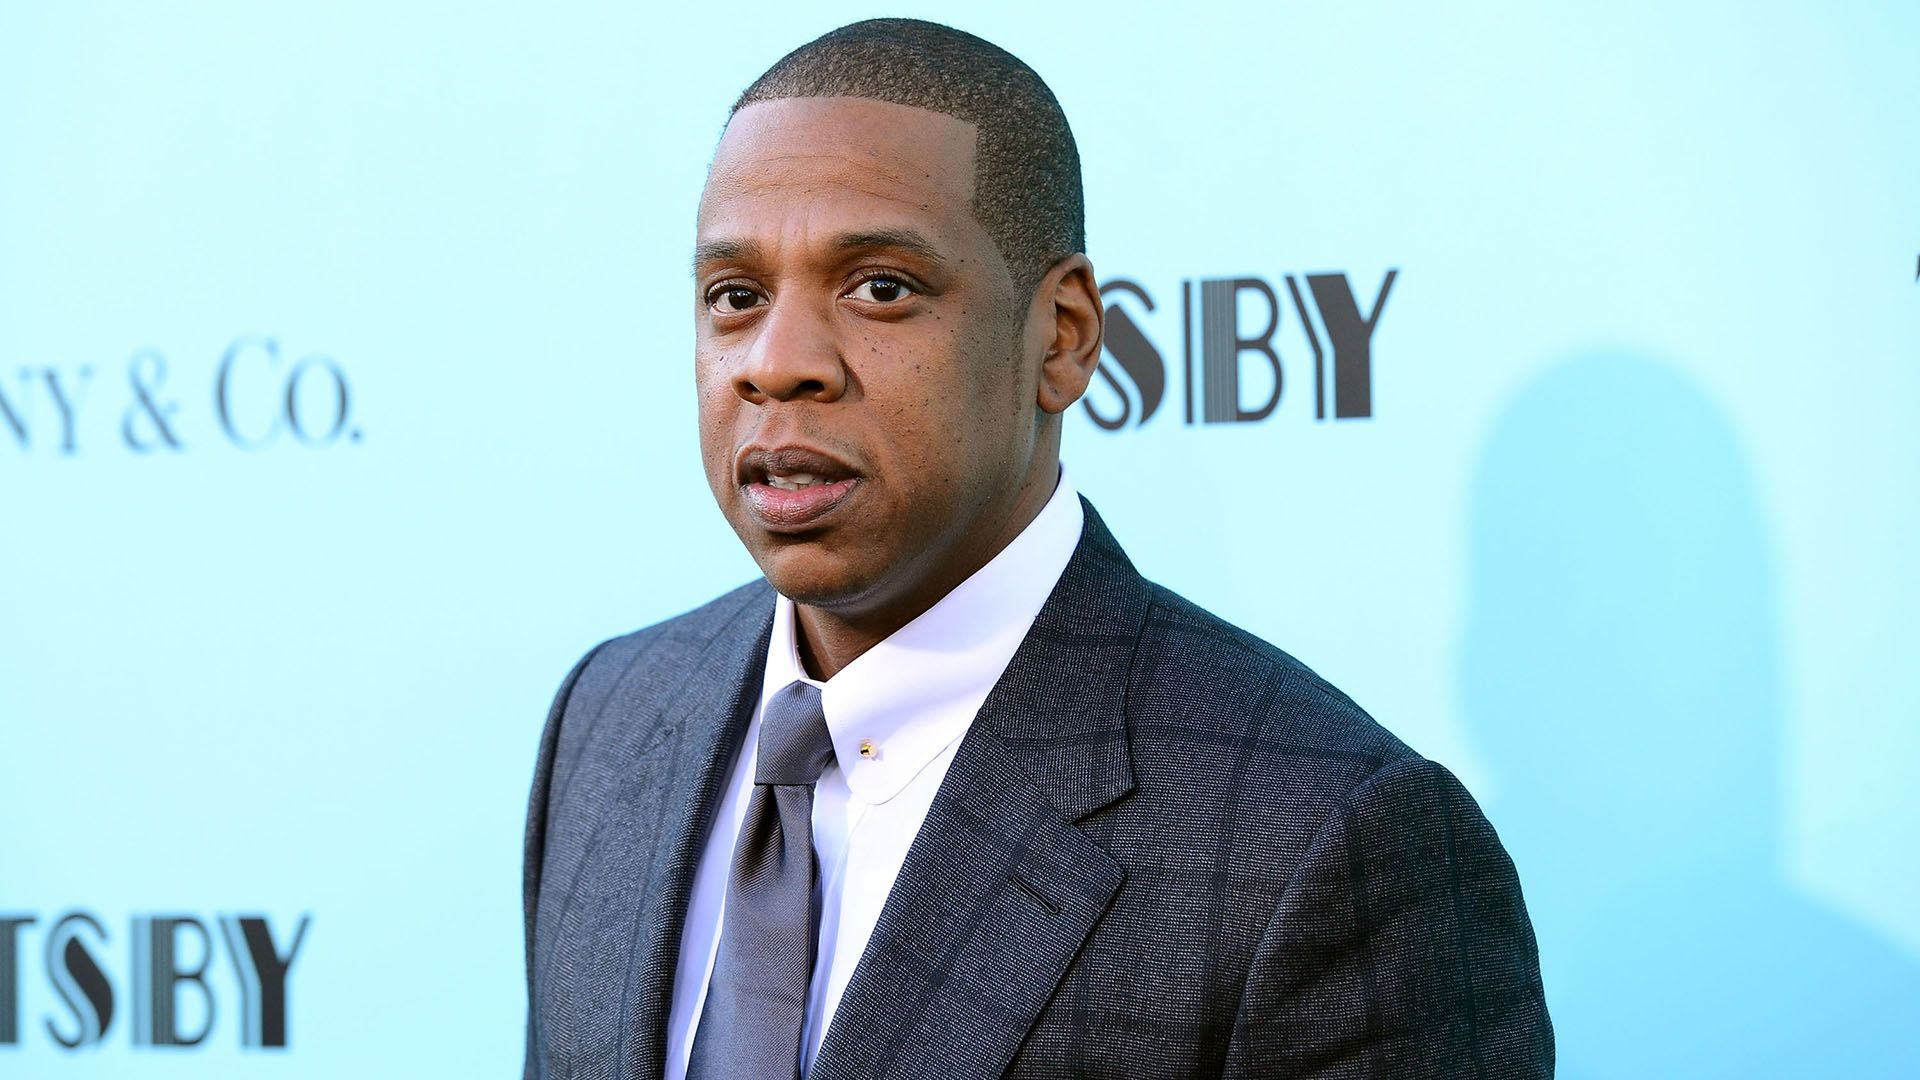 Jay Z Wallpaper Image